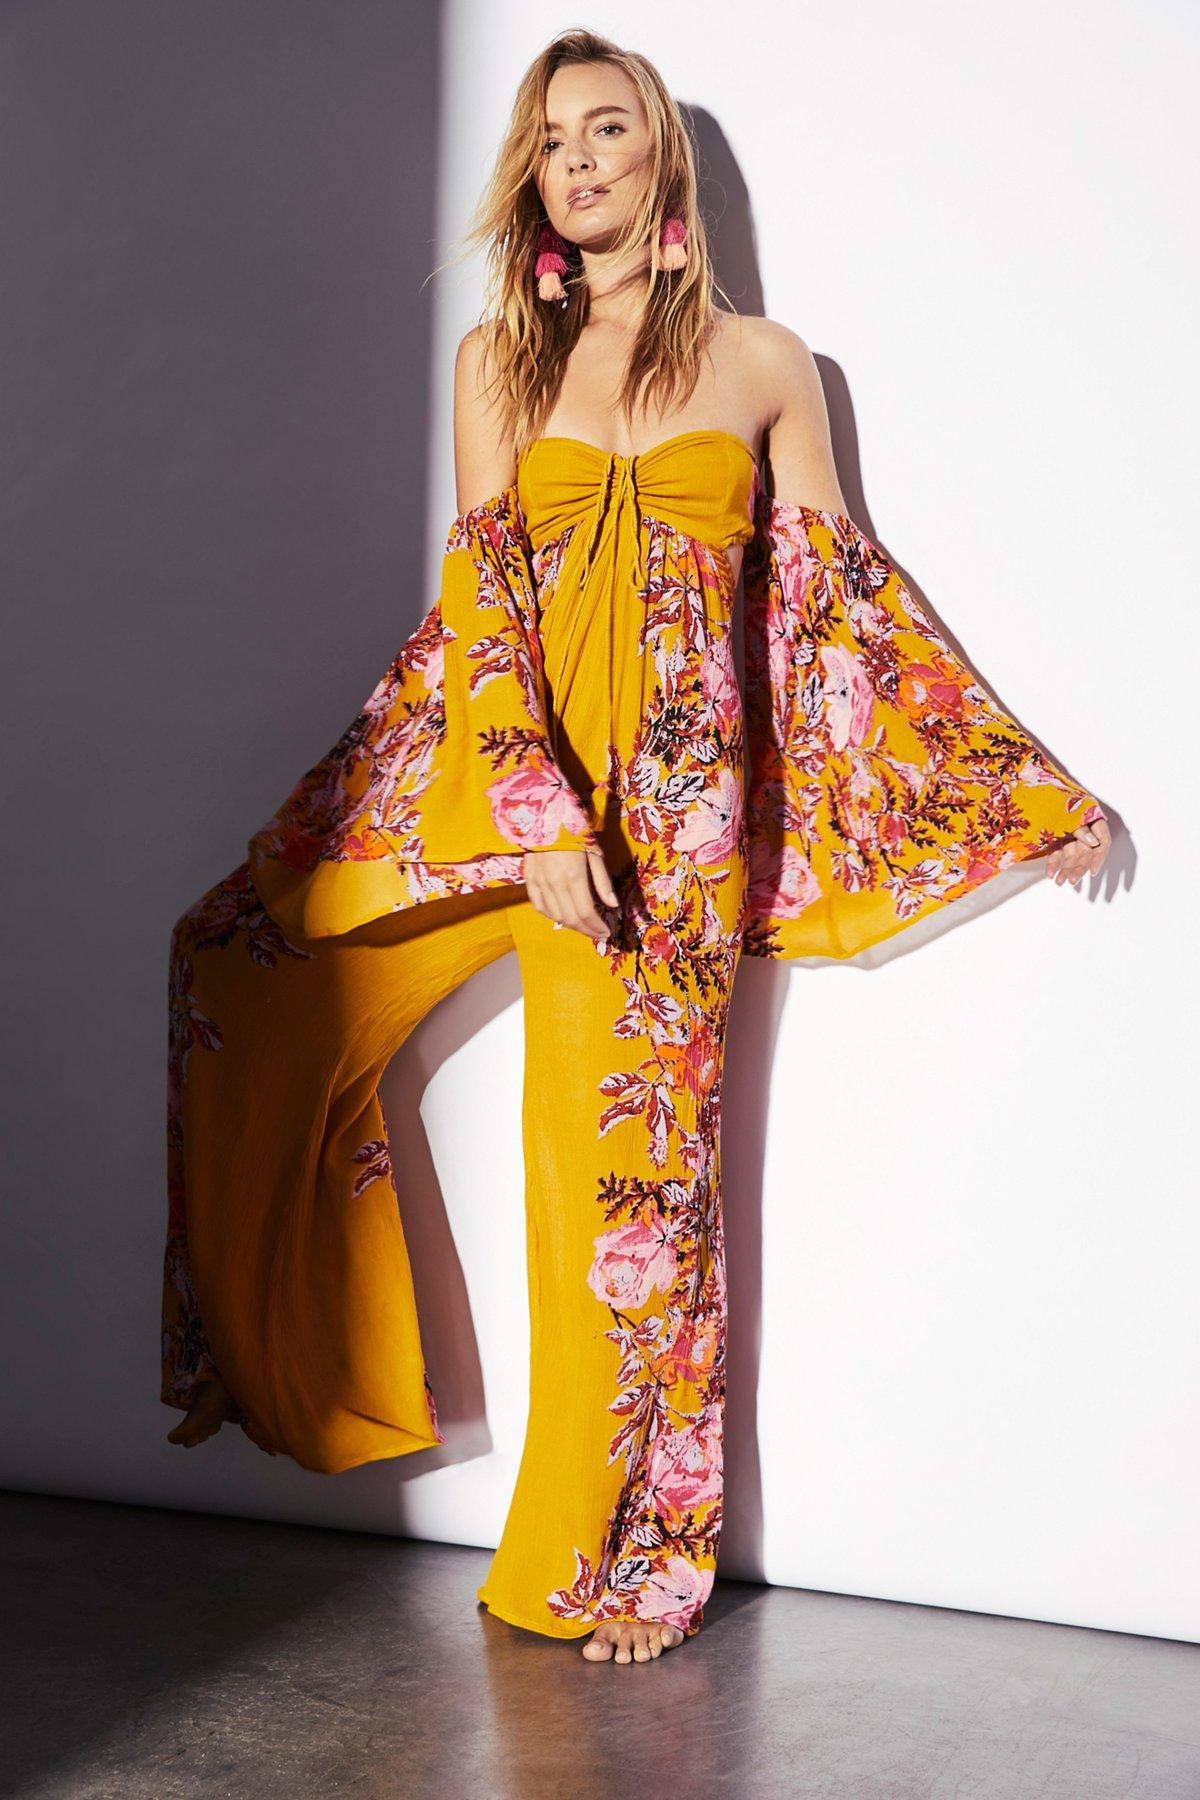 Falling Flowers连体裤